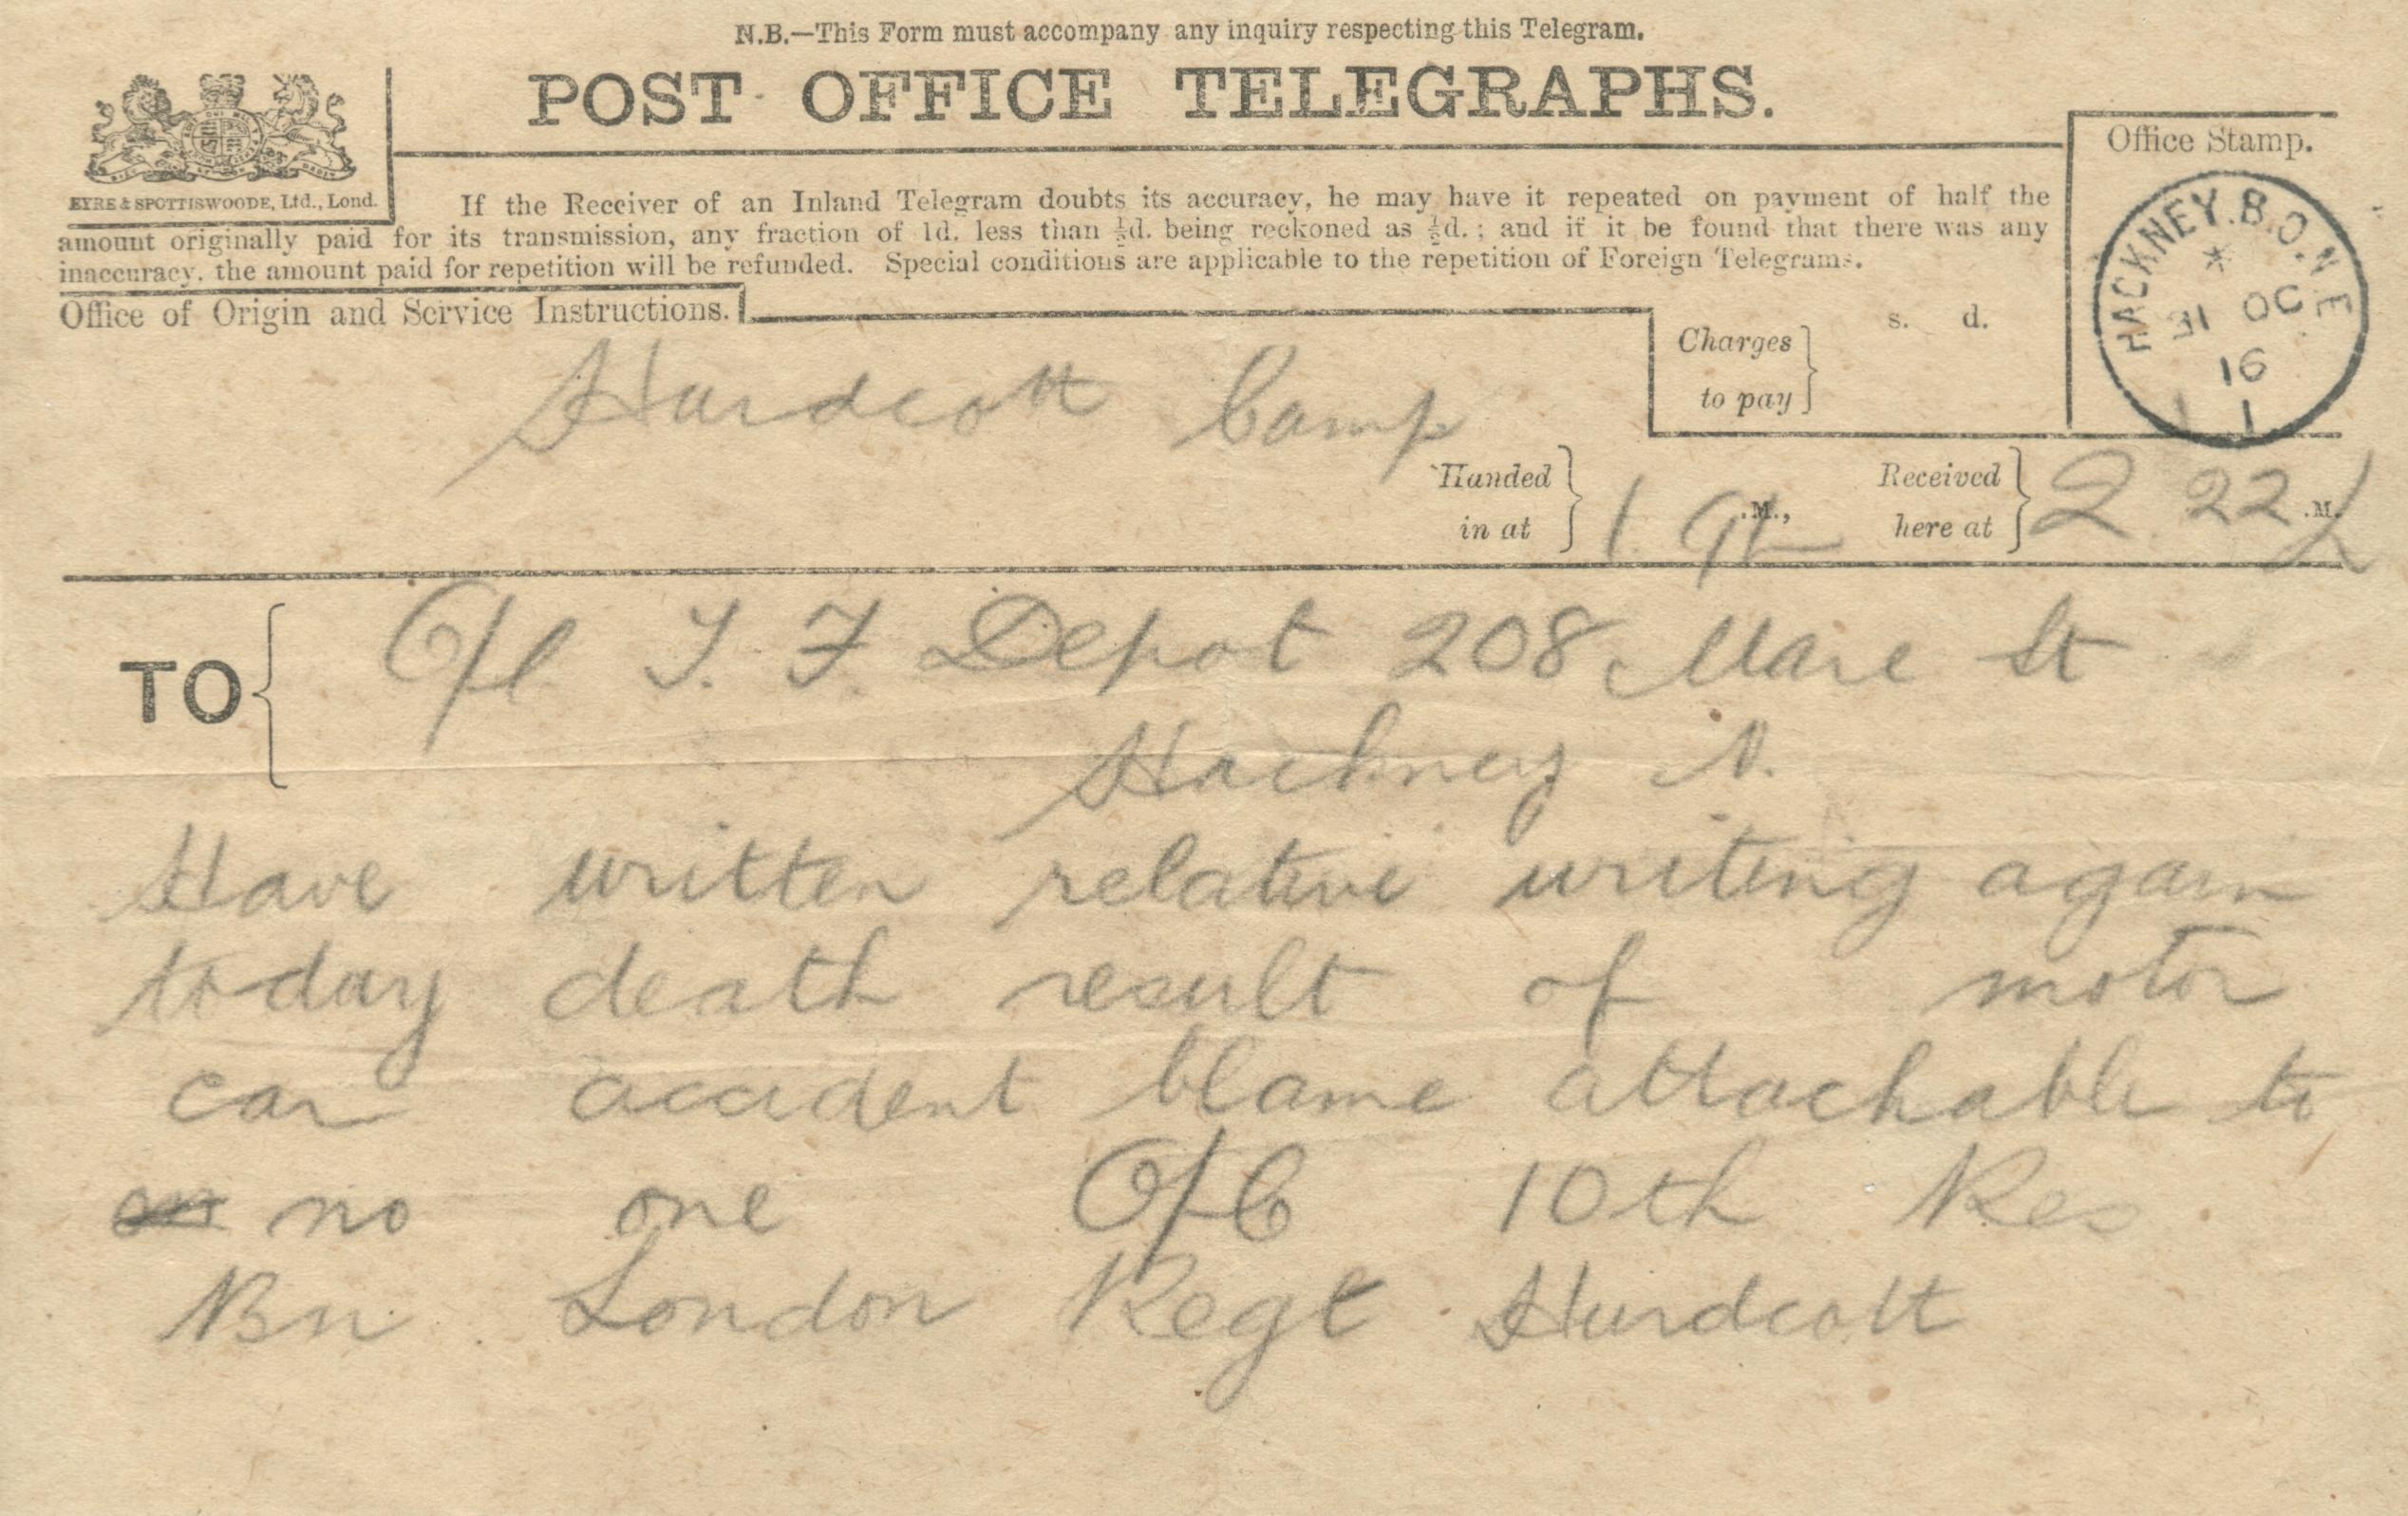 Edward Emsley - telegram